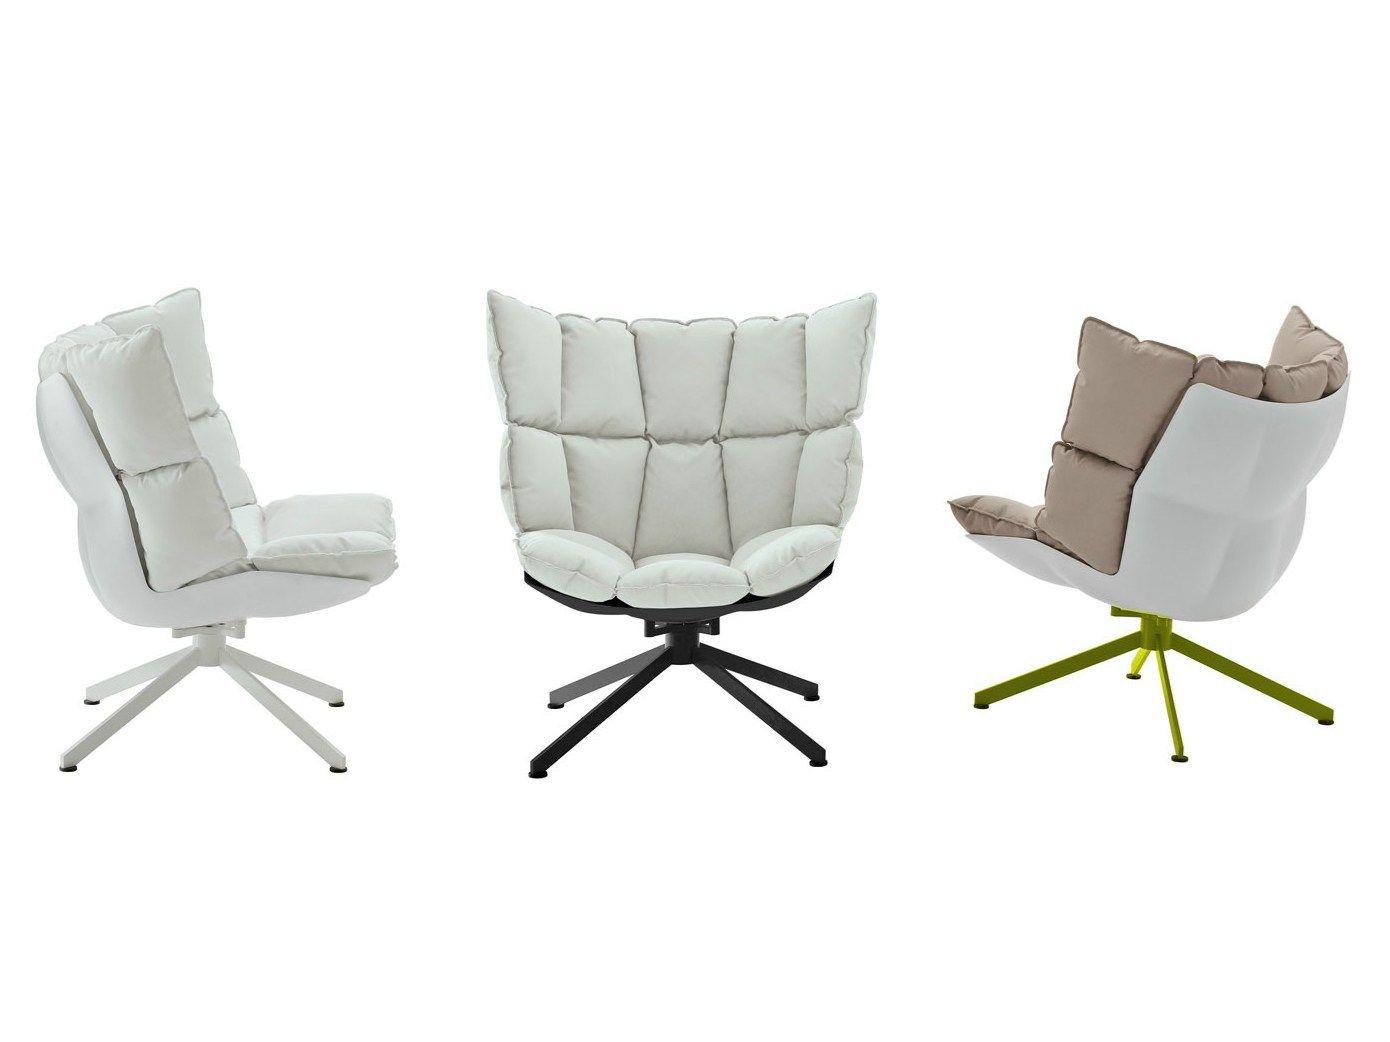 Eames Lounge Chair appuntamentidatazione INTJ maschio